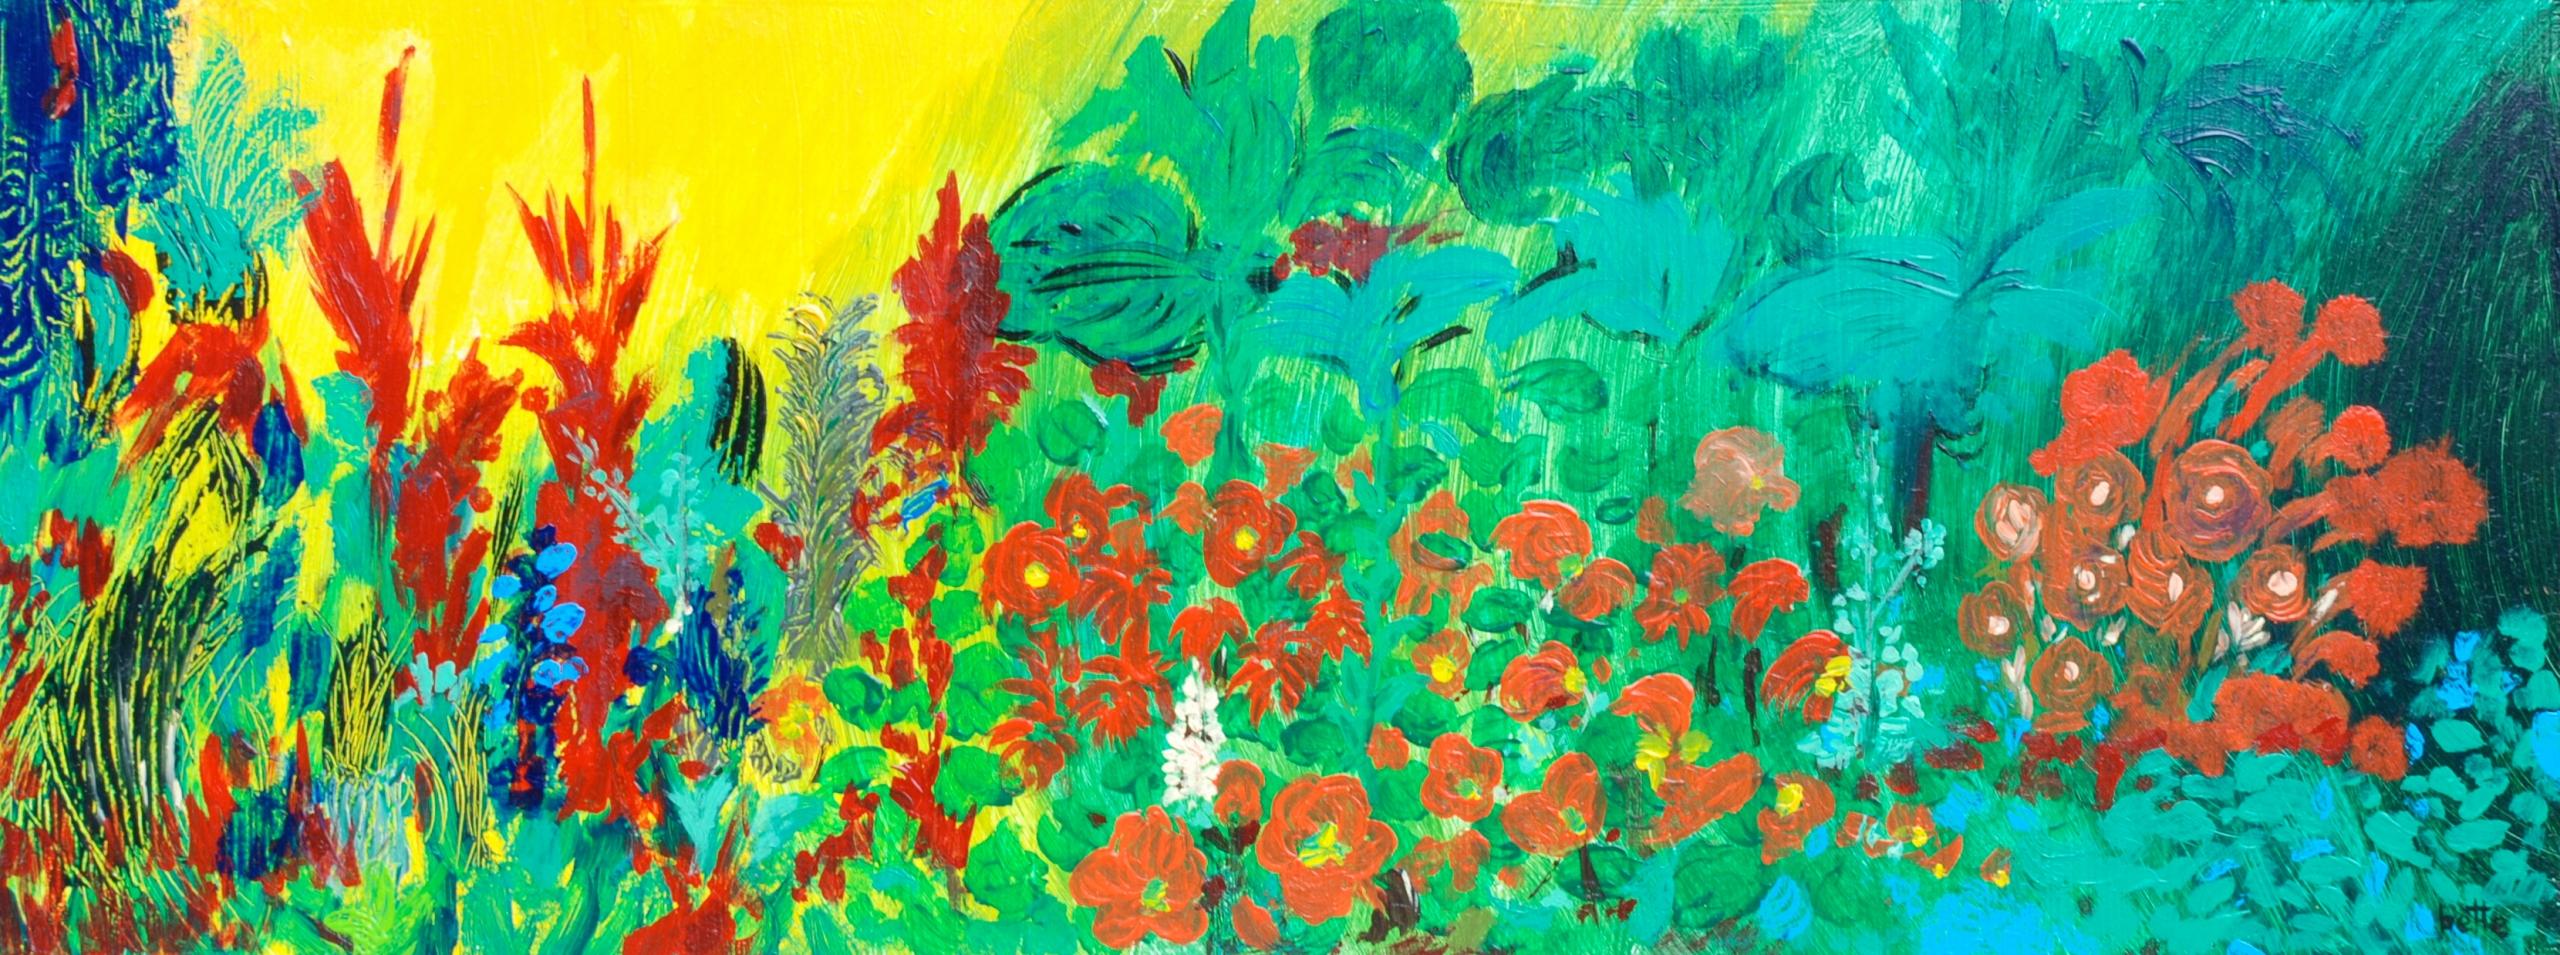 024 - Bloemenpracht